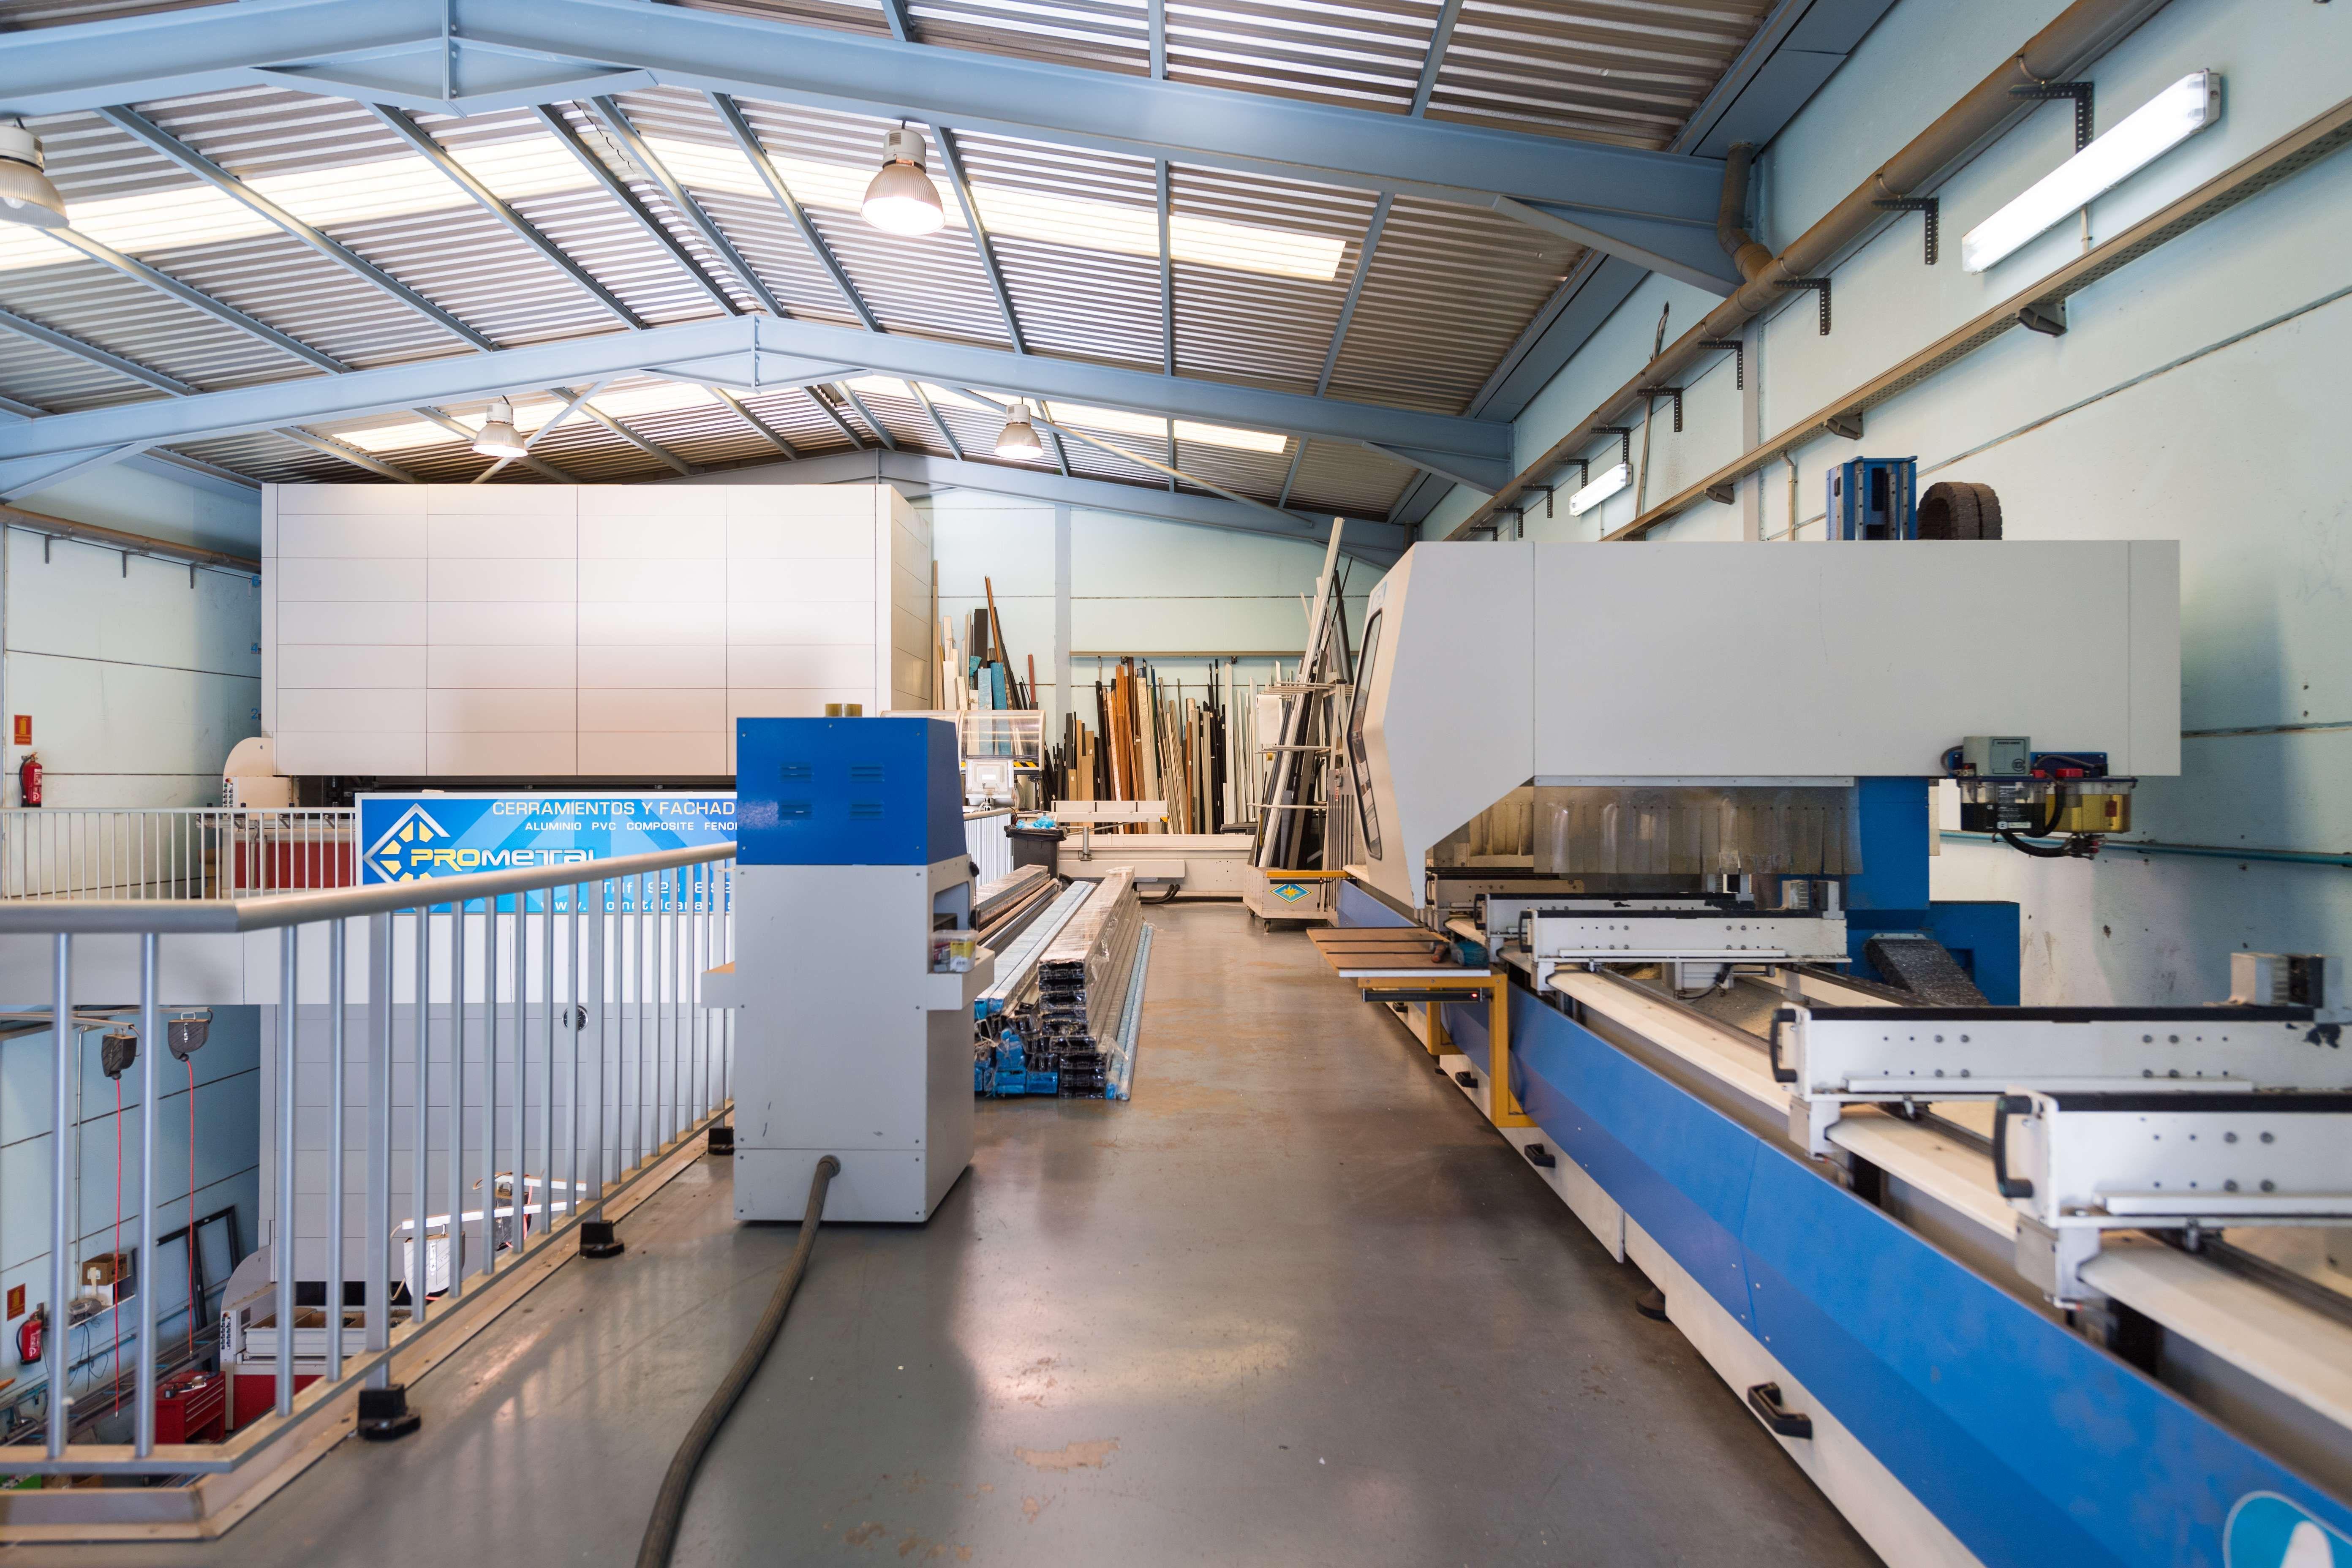 Fabricación de ventanas de aluminio en Gran Canaria